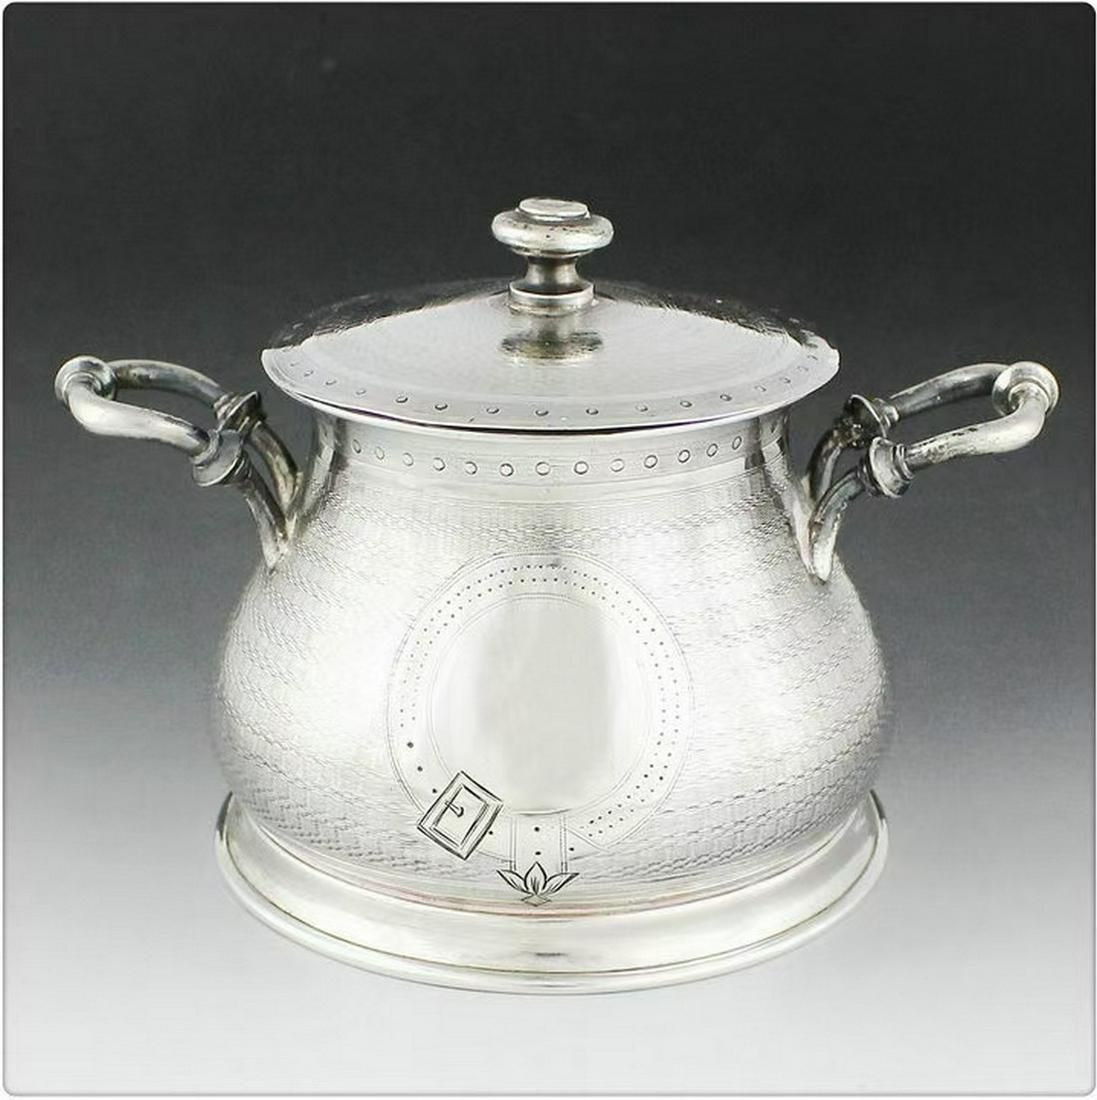 Spanish sterling silver sugar bowl